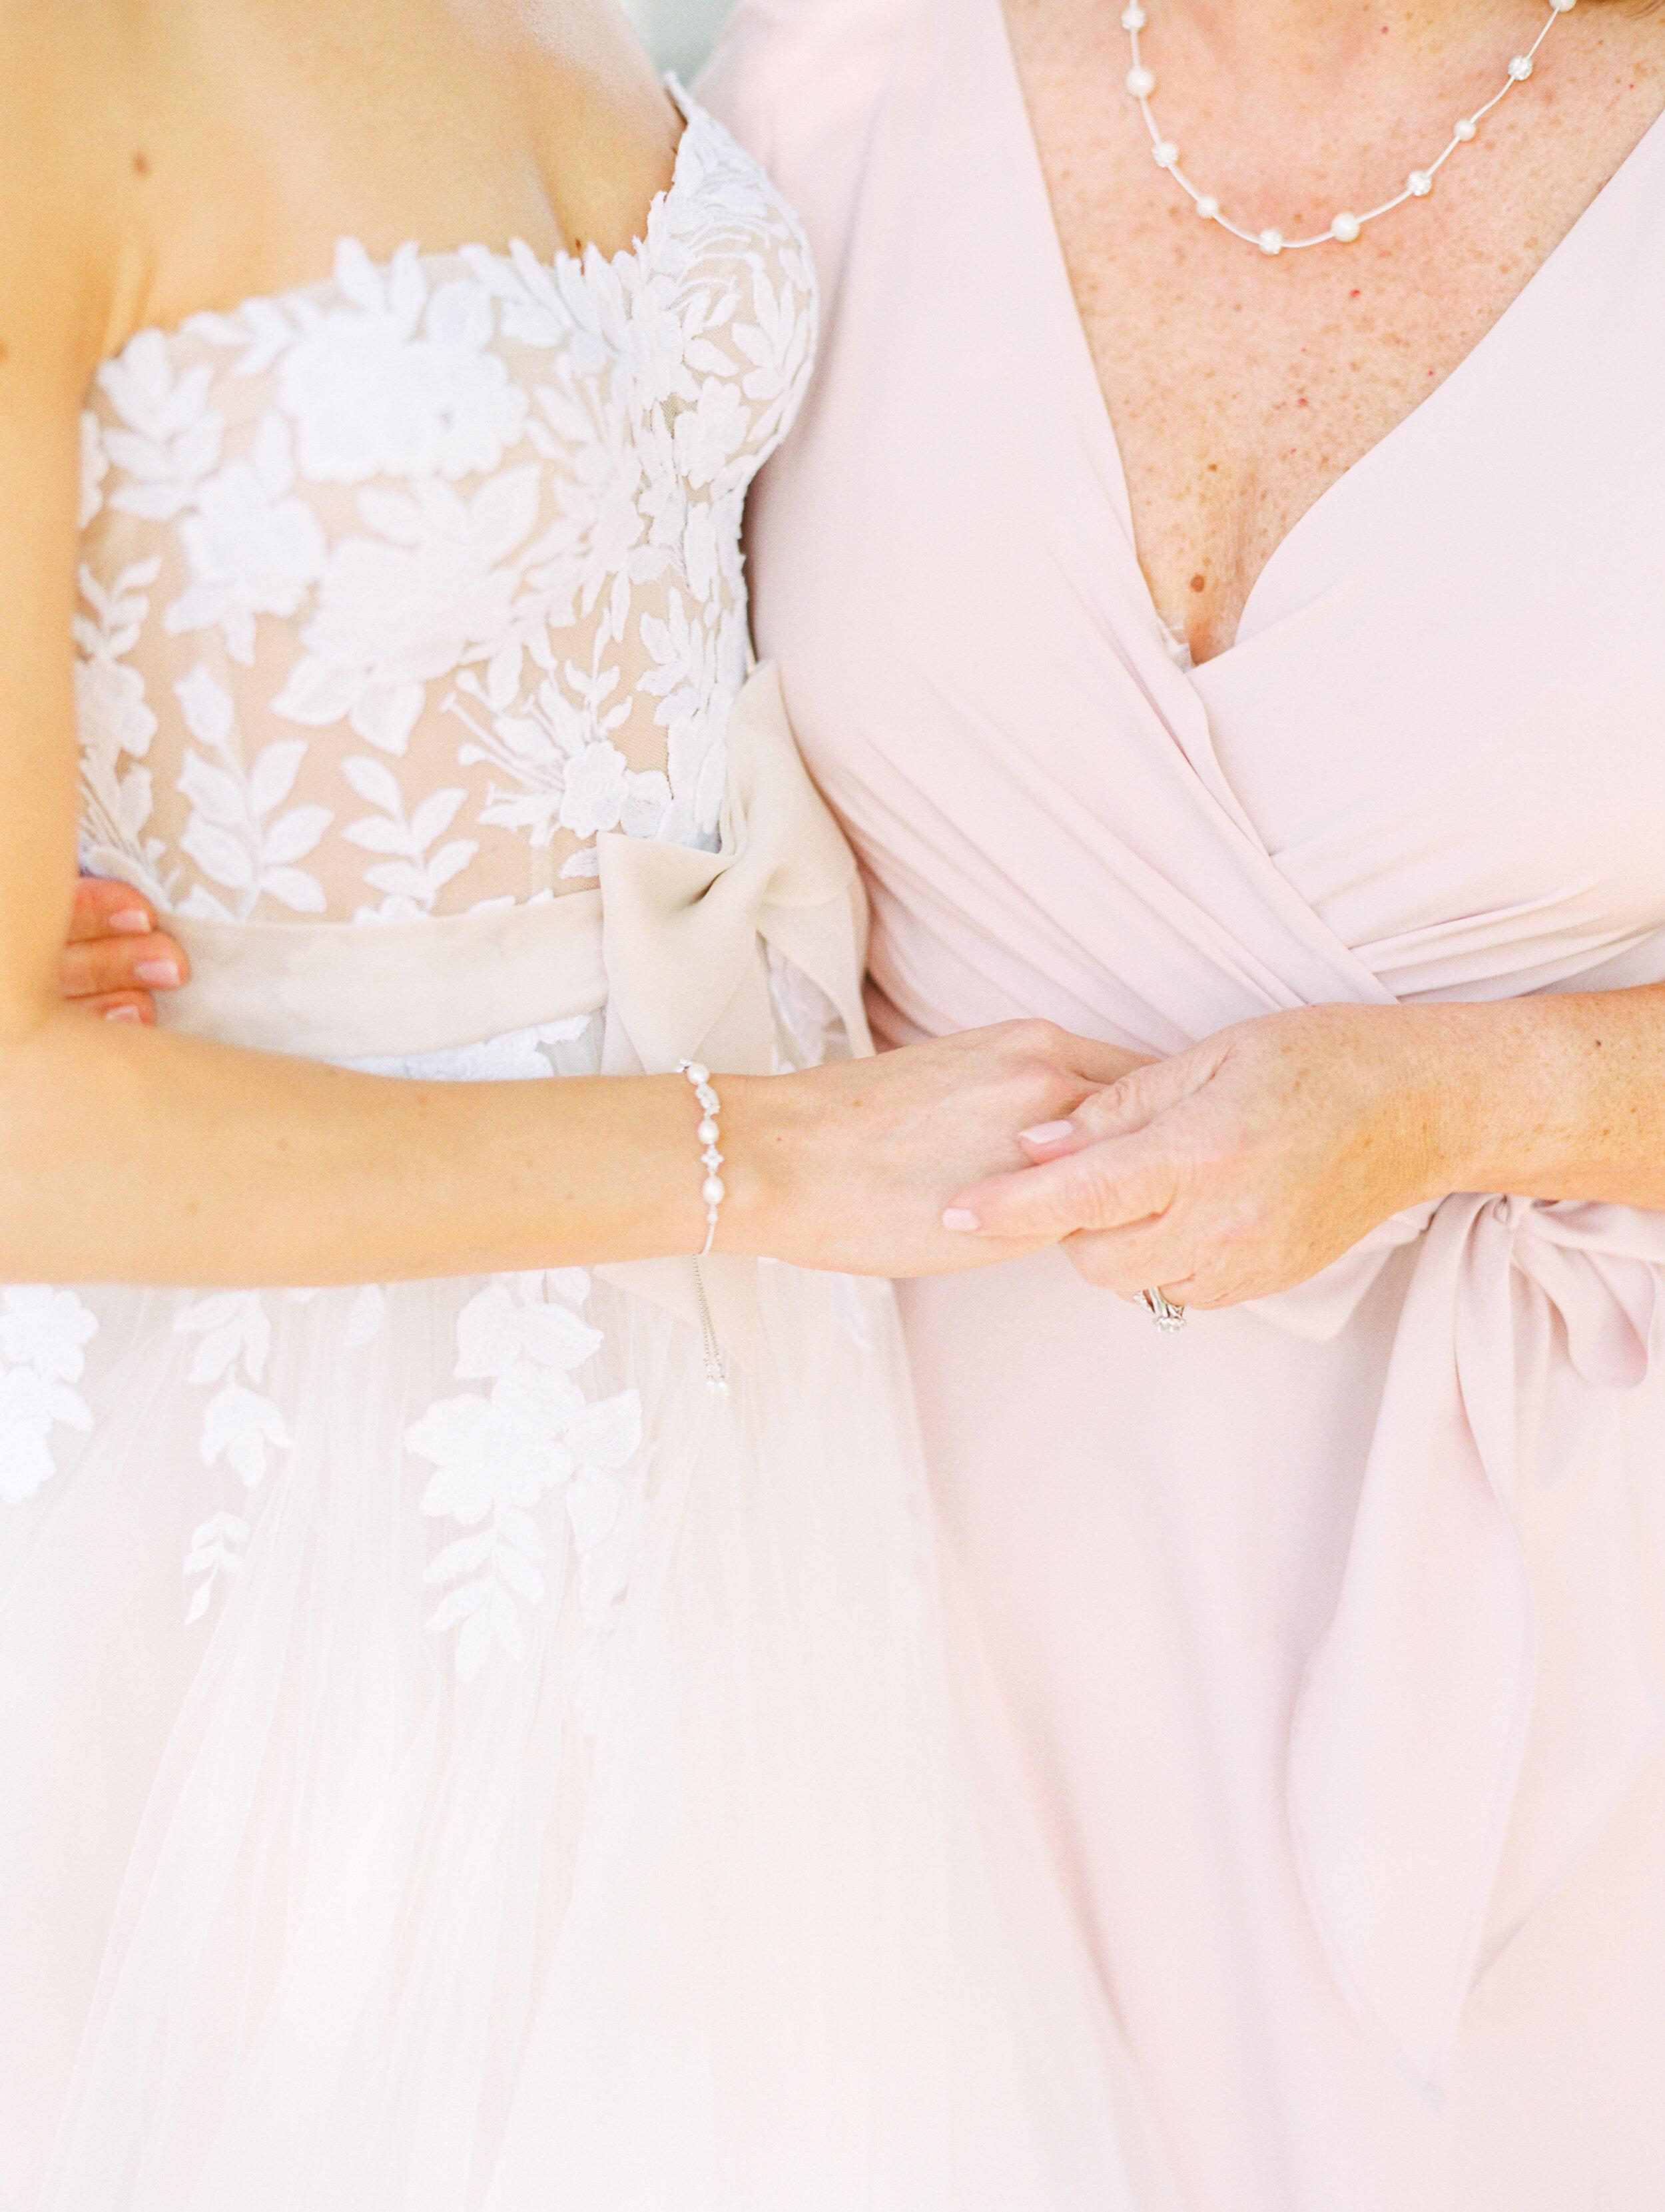 Steinlage+Wedding+Getting+Ready-101.jpg